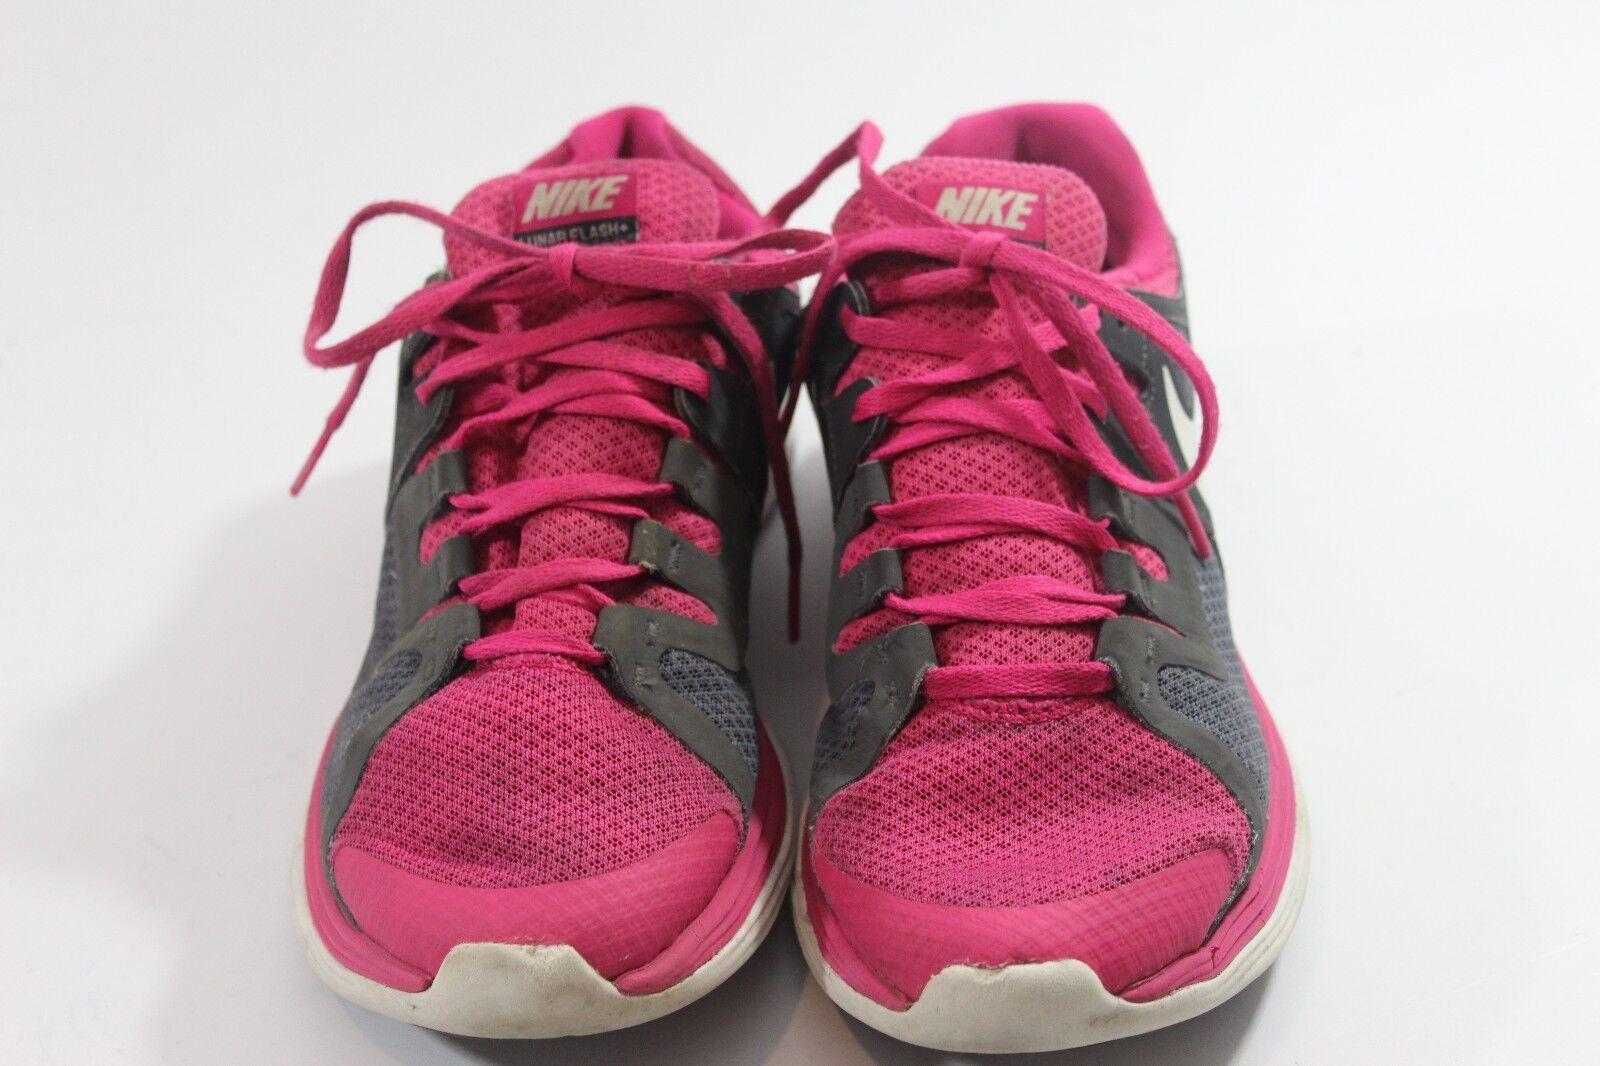 Women's Nike Lunarflash + Pink Summit White Anthrct 580397 610 Comfortable Seasonal clearance sale